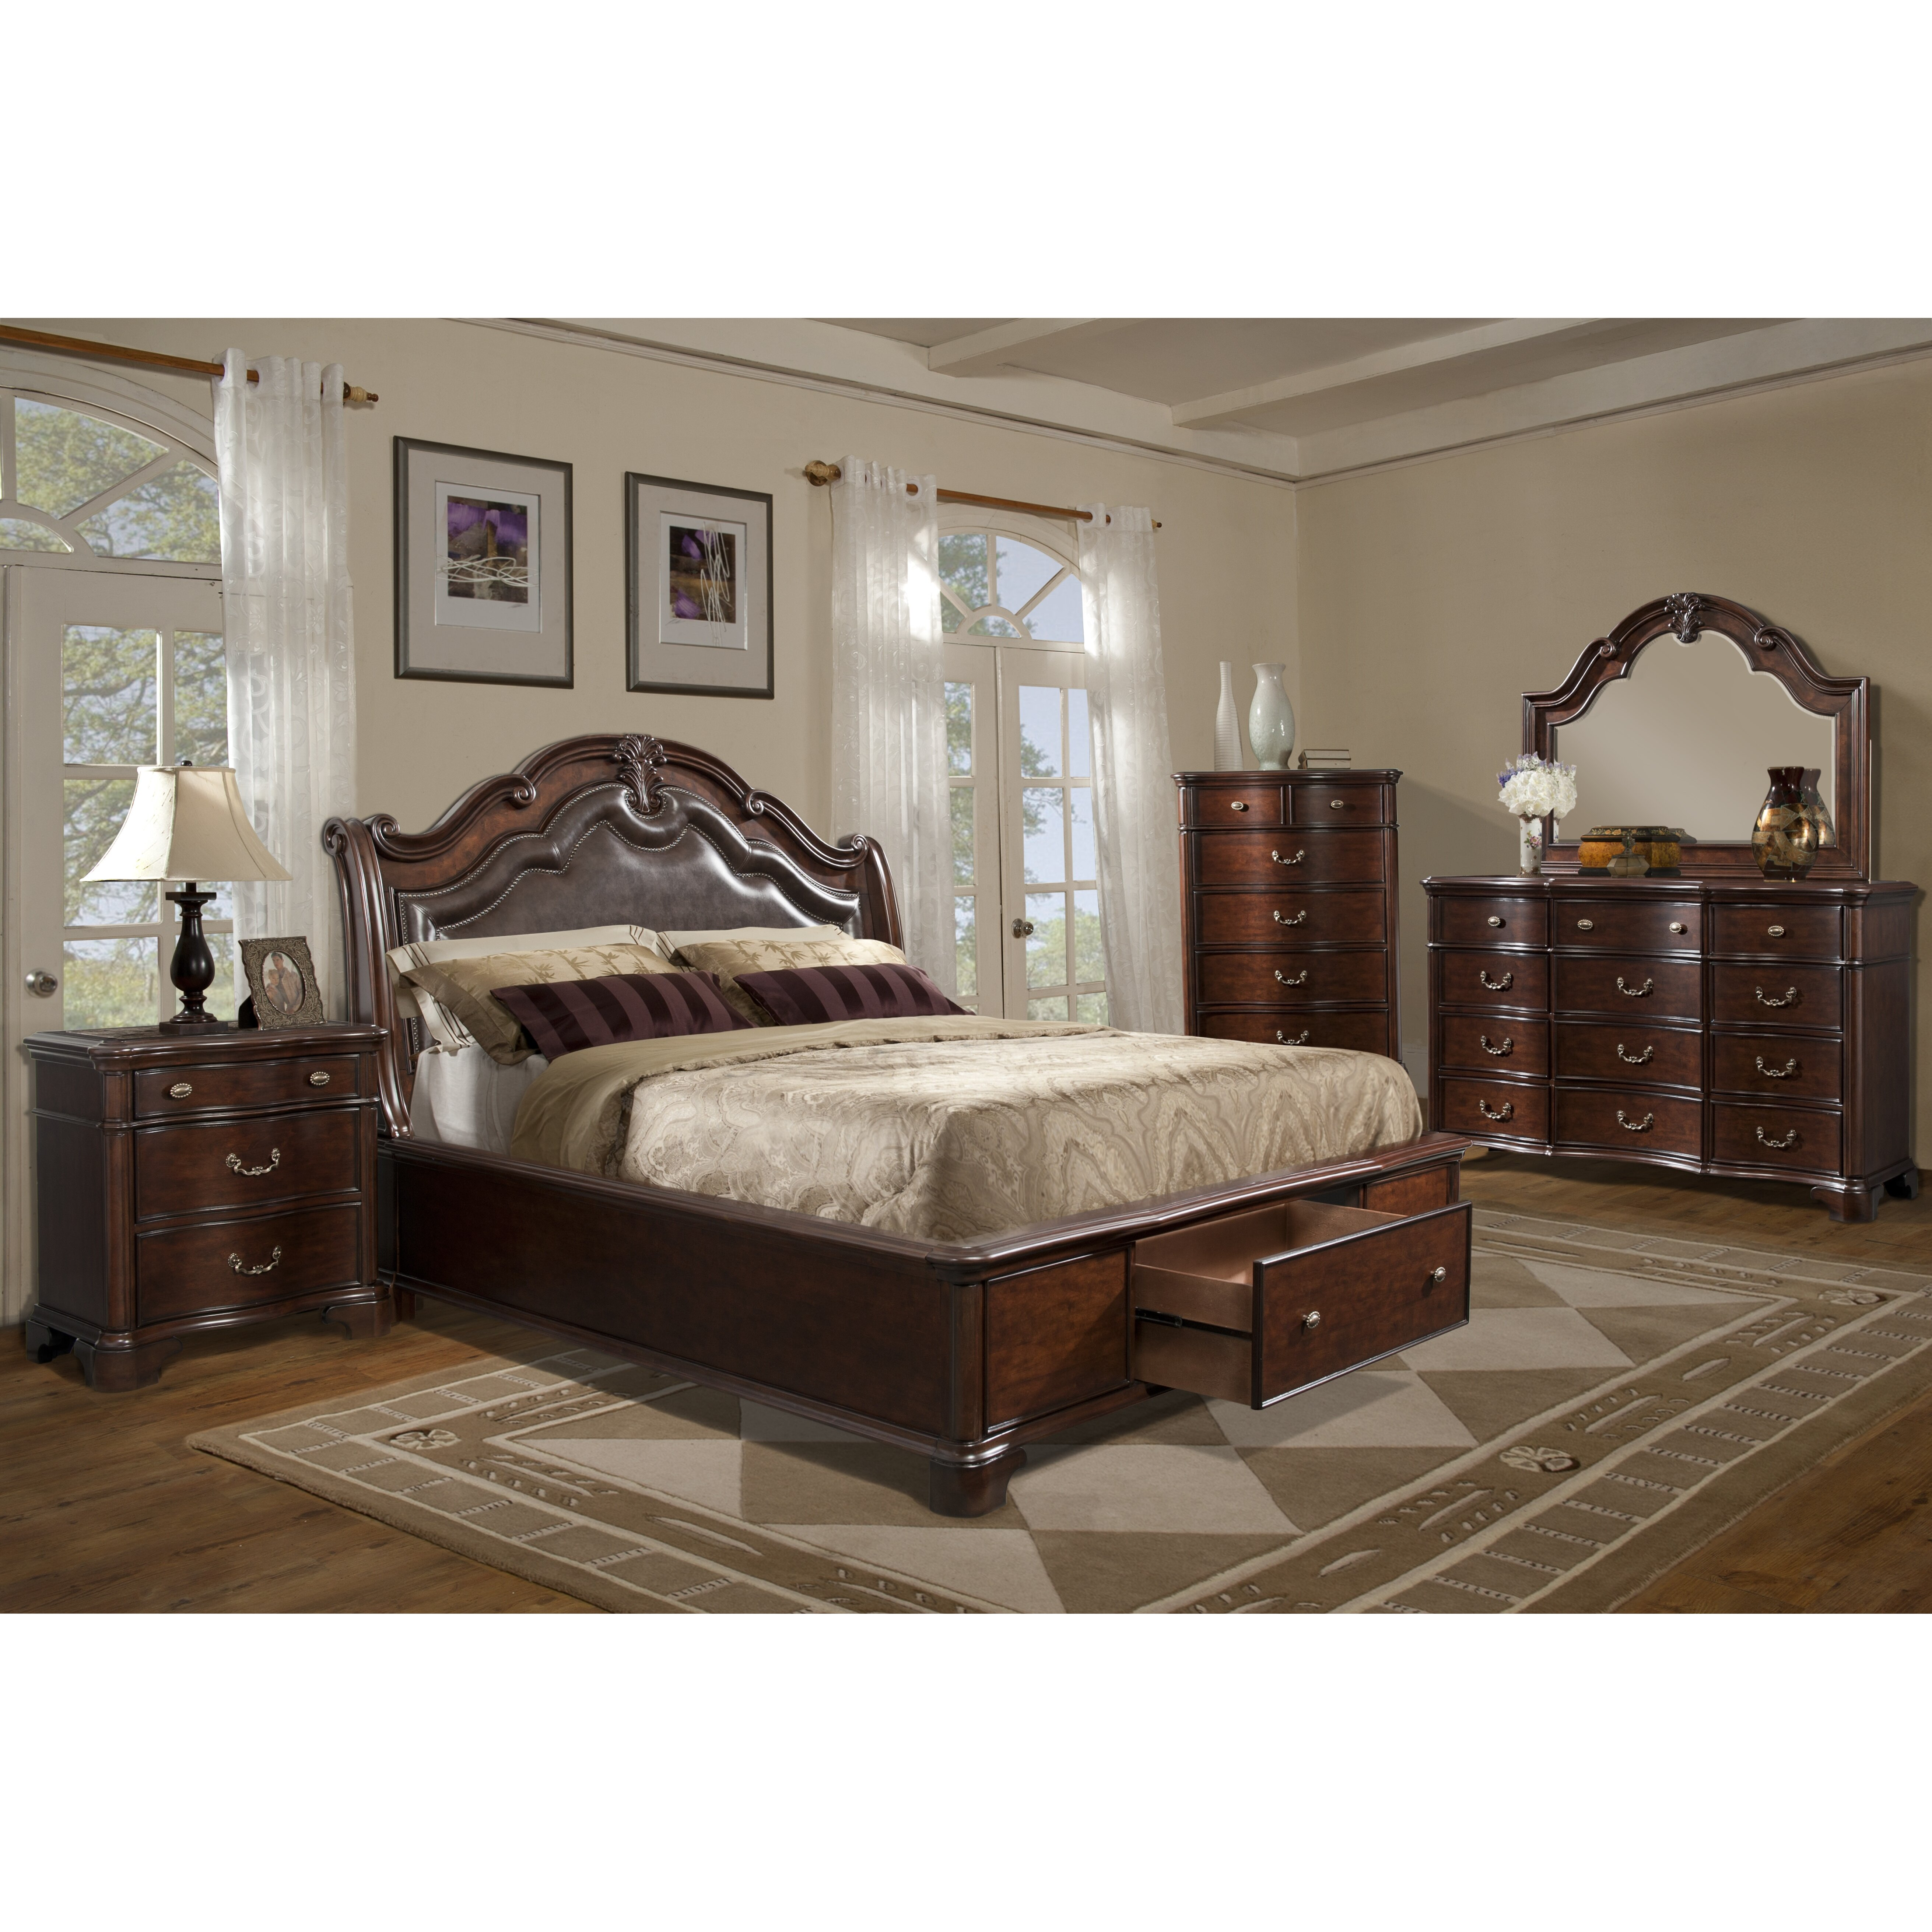 furniture bedroom furniture cherry dressers astoria grand sku